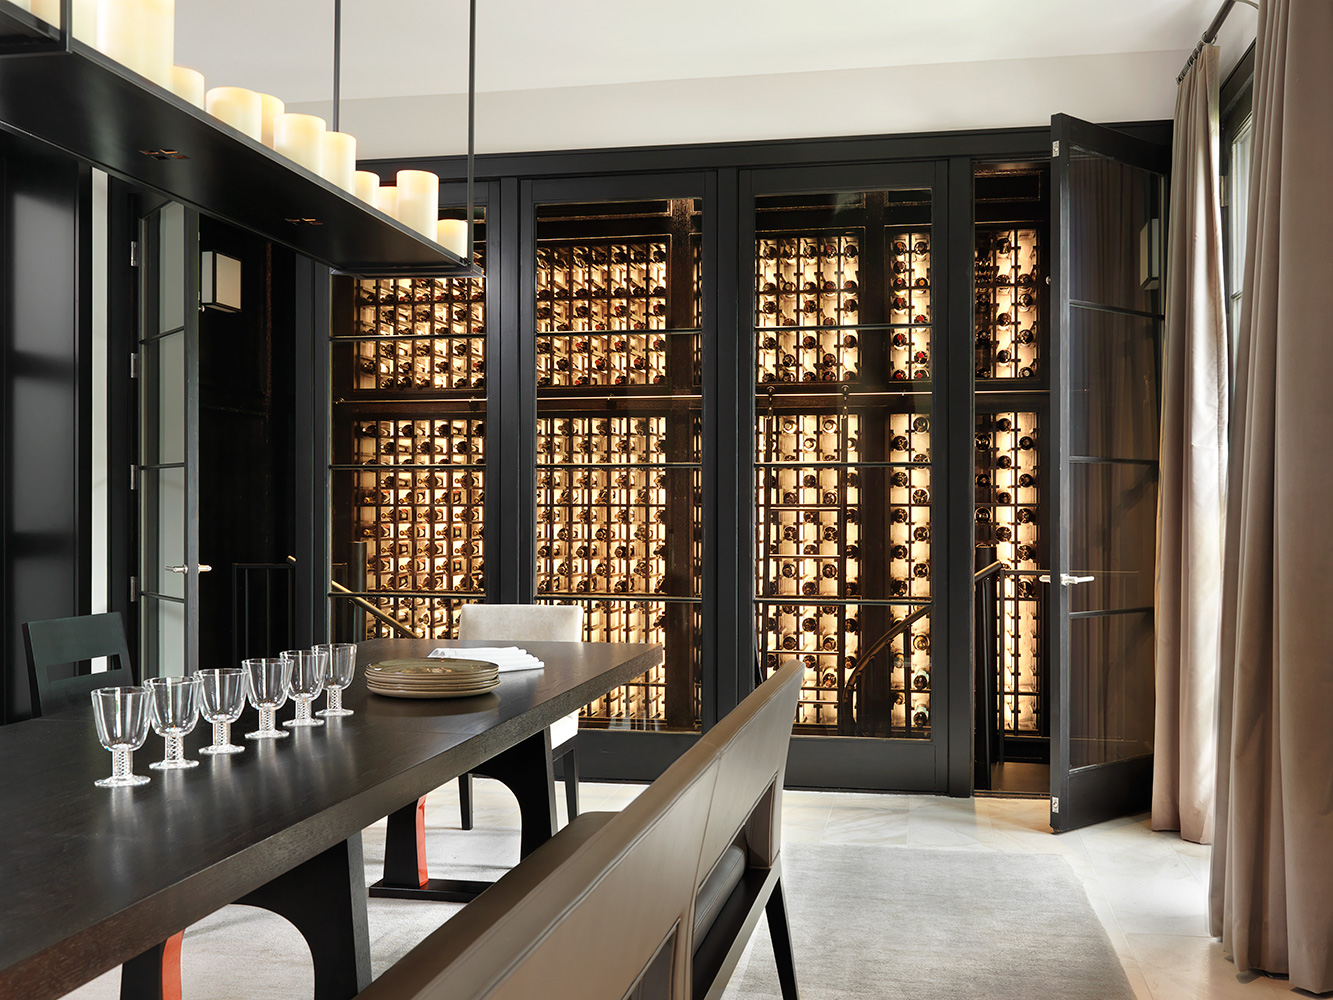 Design by Dana Hauck of Castle Design